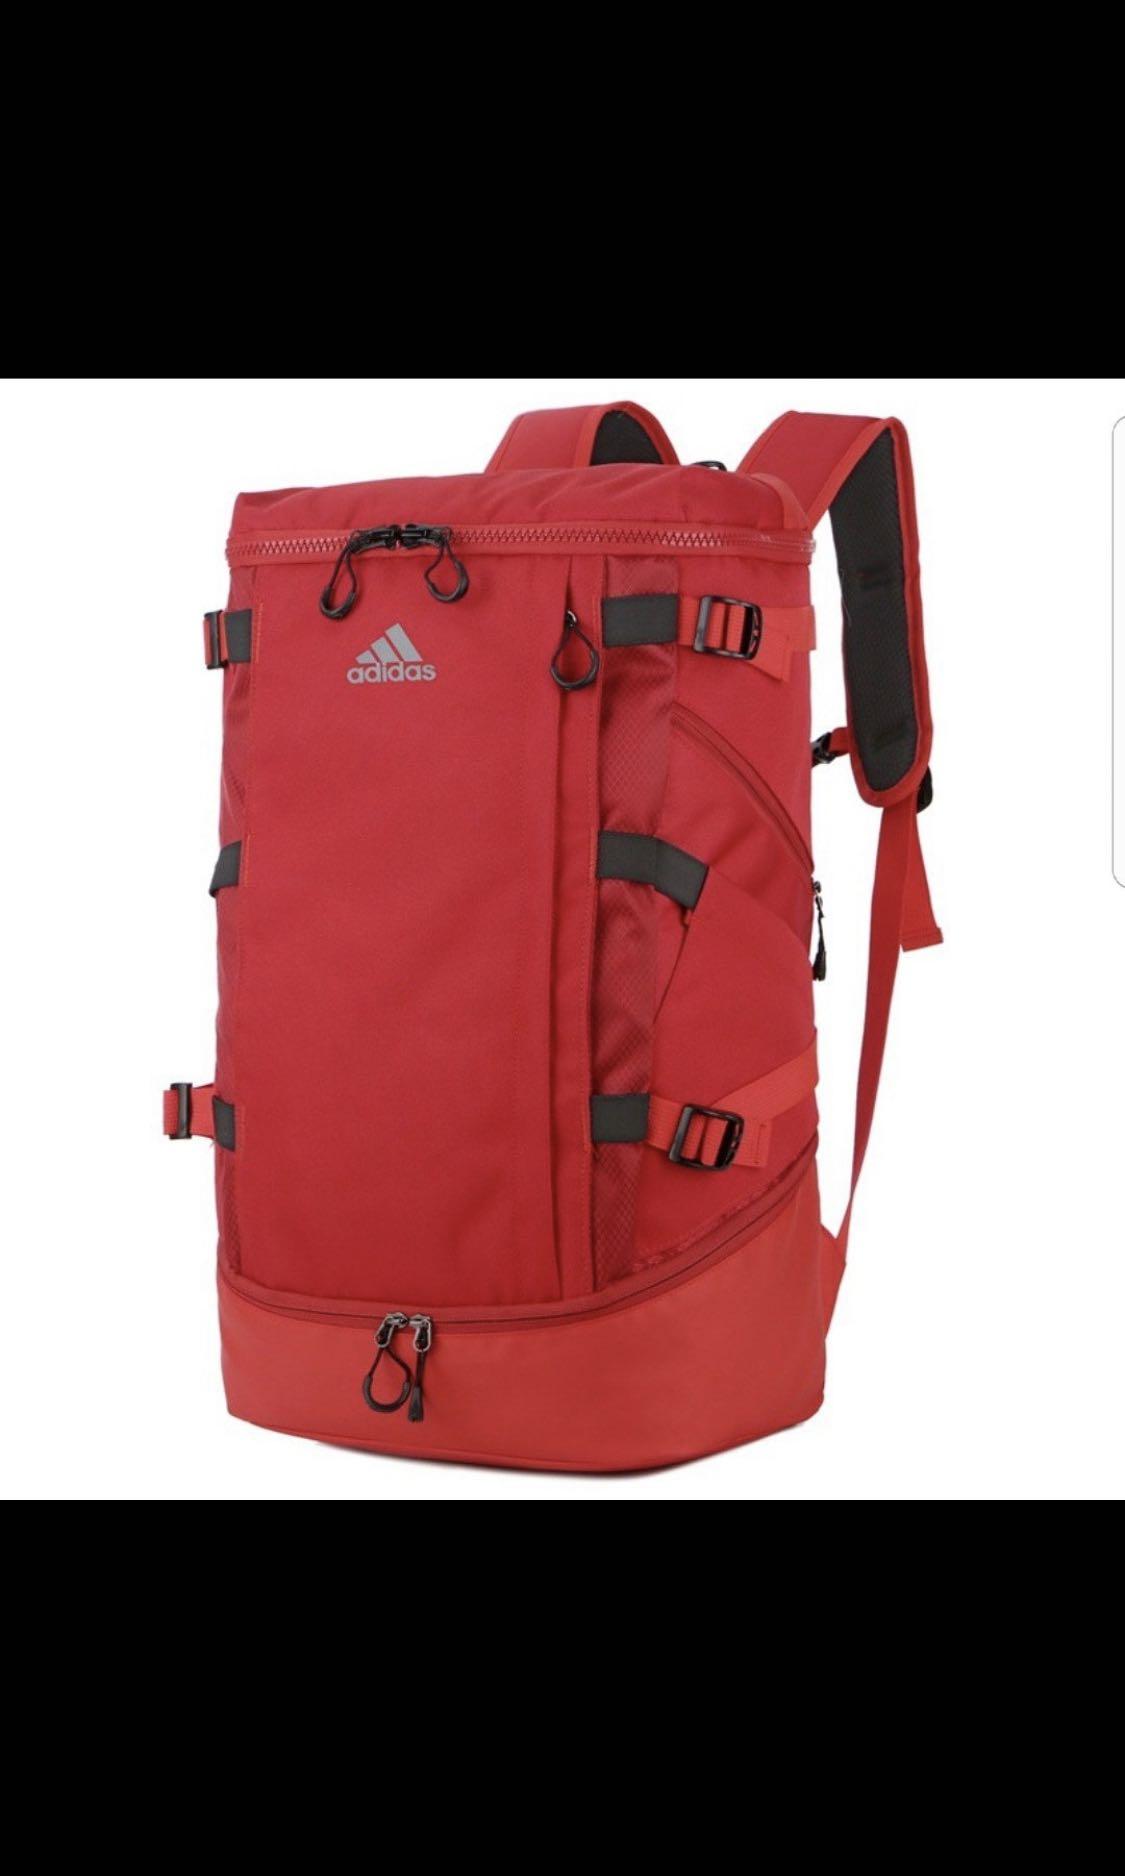 a31c1da269 Home · Luxury · Bags   Wallets · Backpacks. photo photo photo